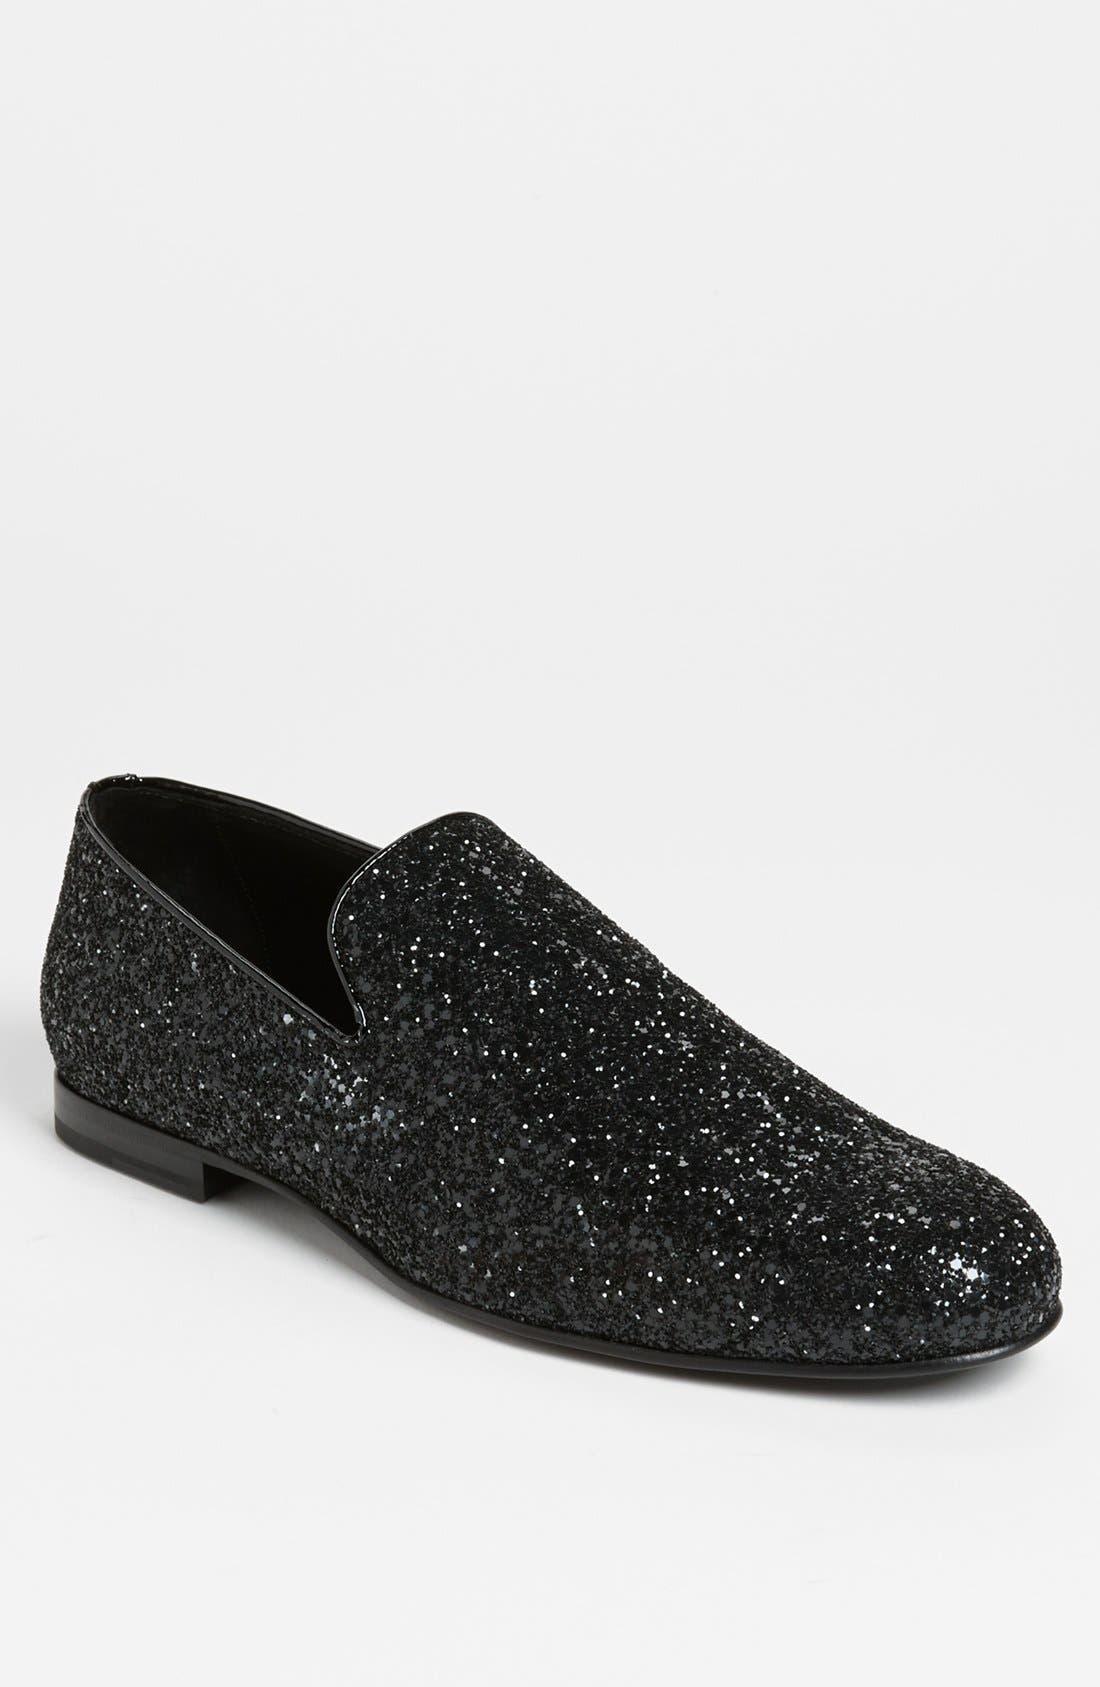 White Leather Guy Slip-On Sneakers Jimmy Choo London RXkOx